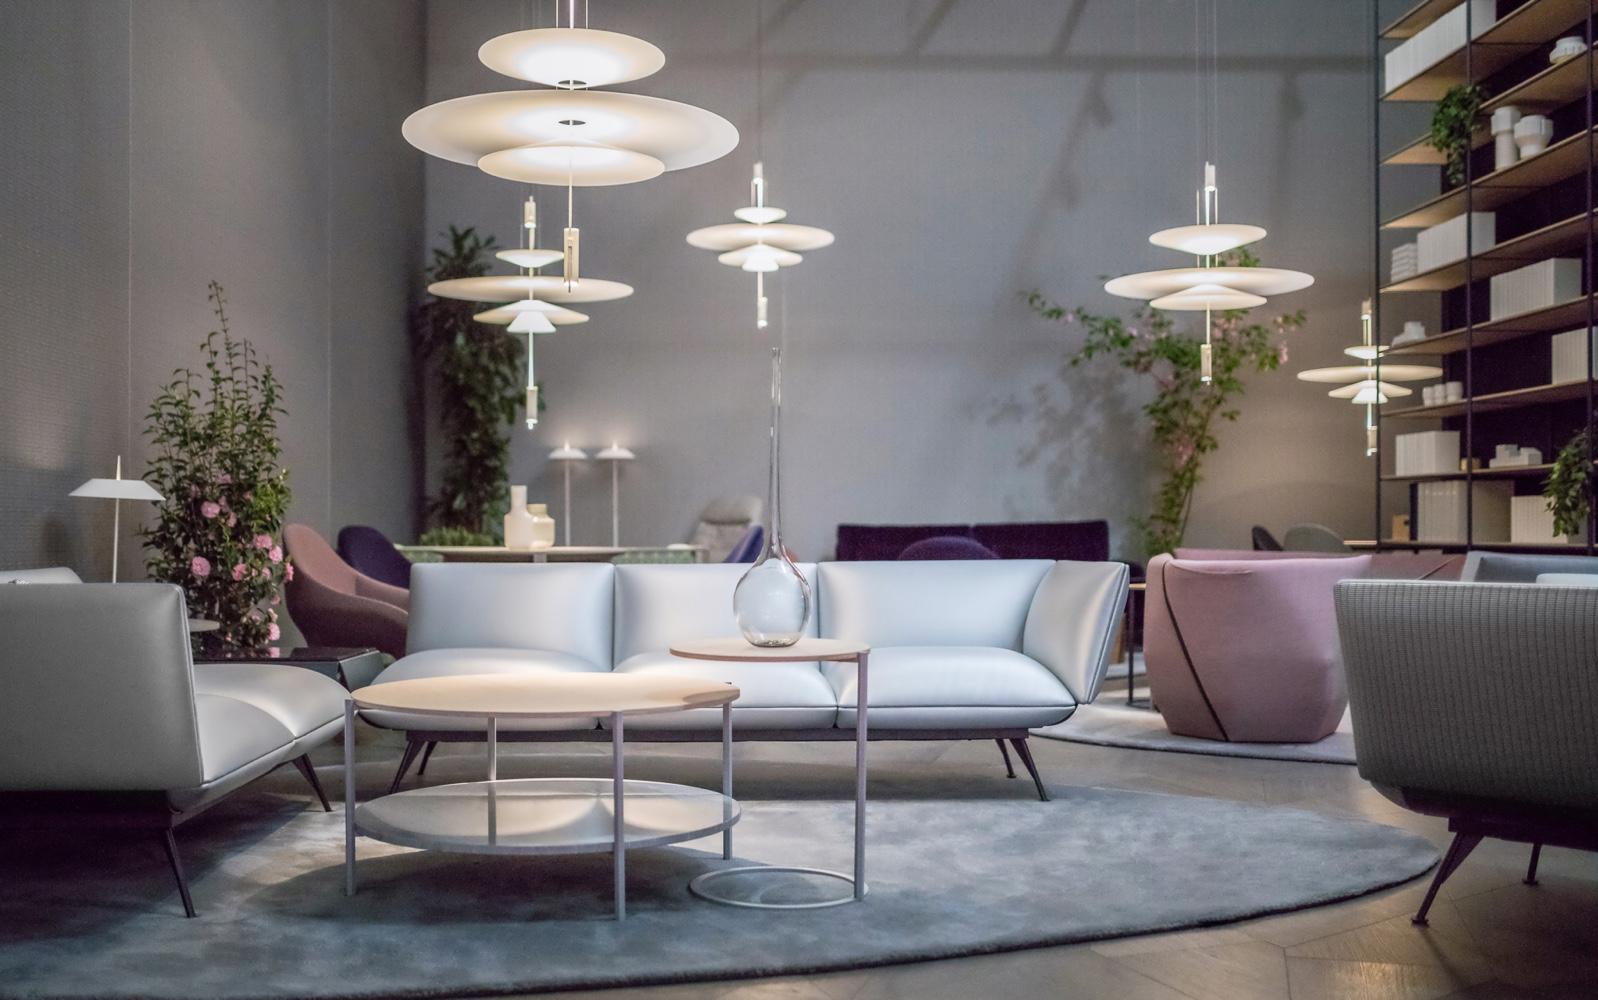 Comforty-Altair-sofa-systemJPG